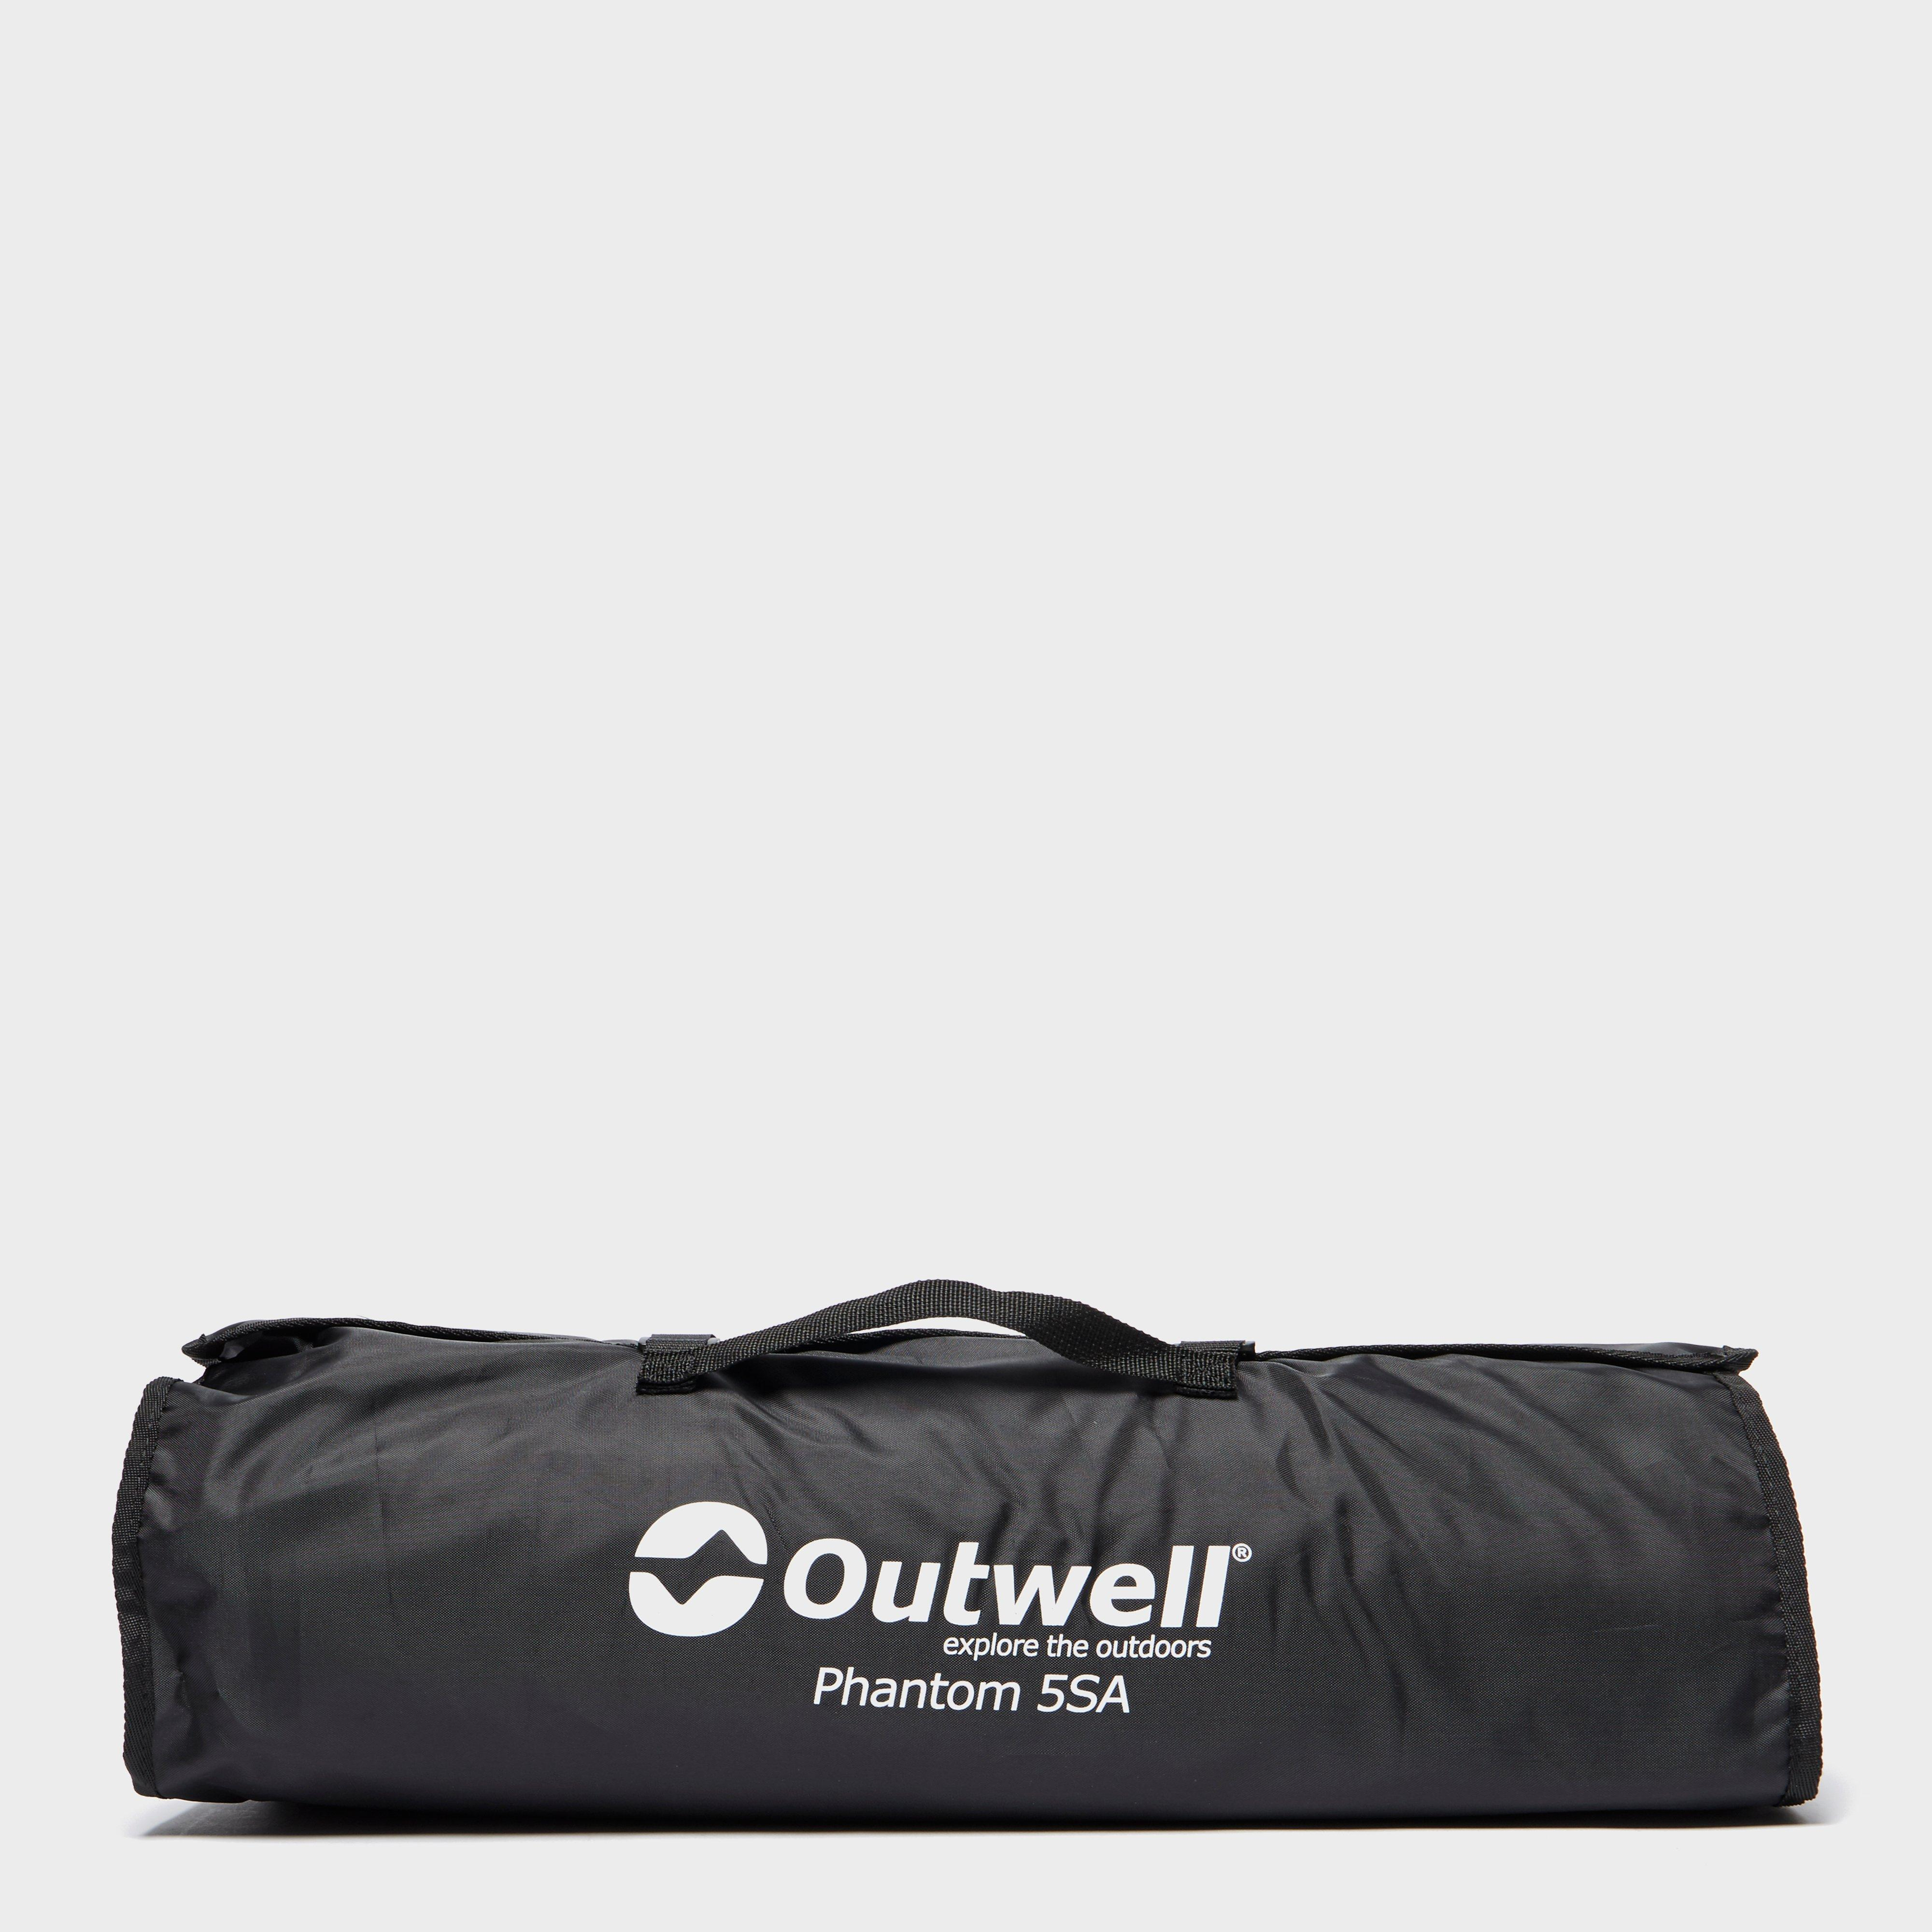 Outwell Phantom 5SA Fleece Carpet - Grey, Grey